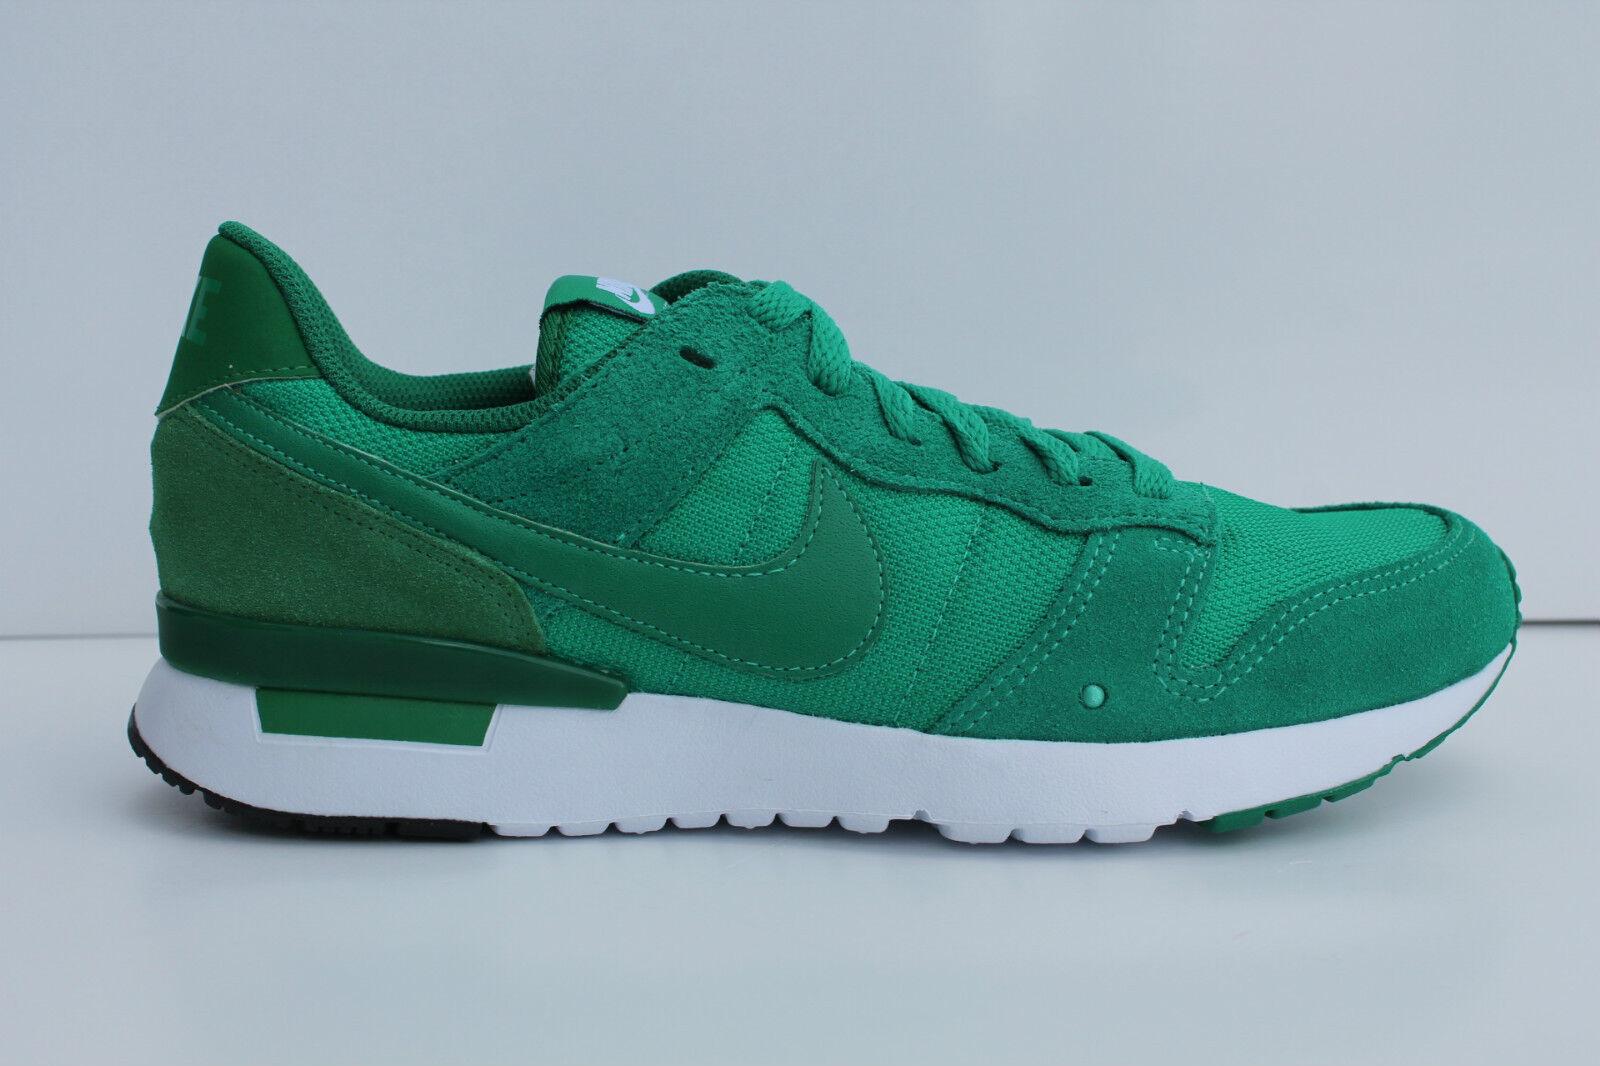 Nike mod Archiv 83 aus grün (2)